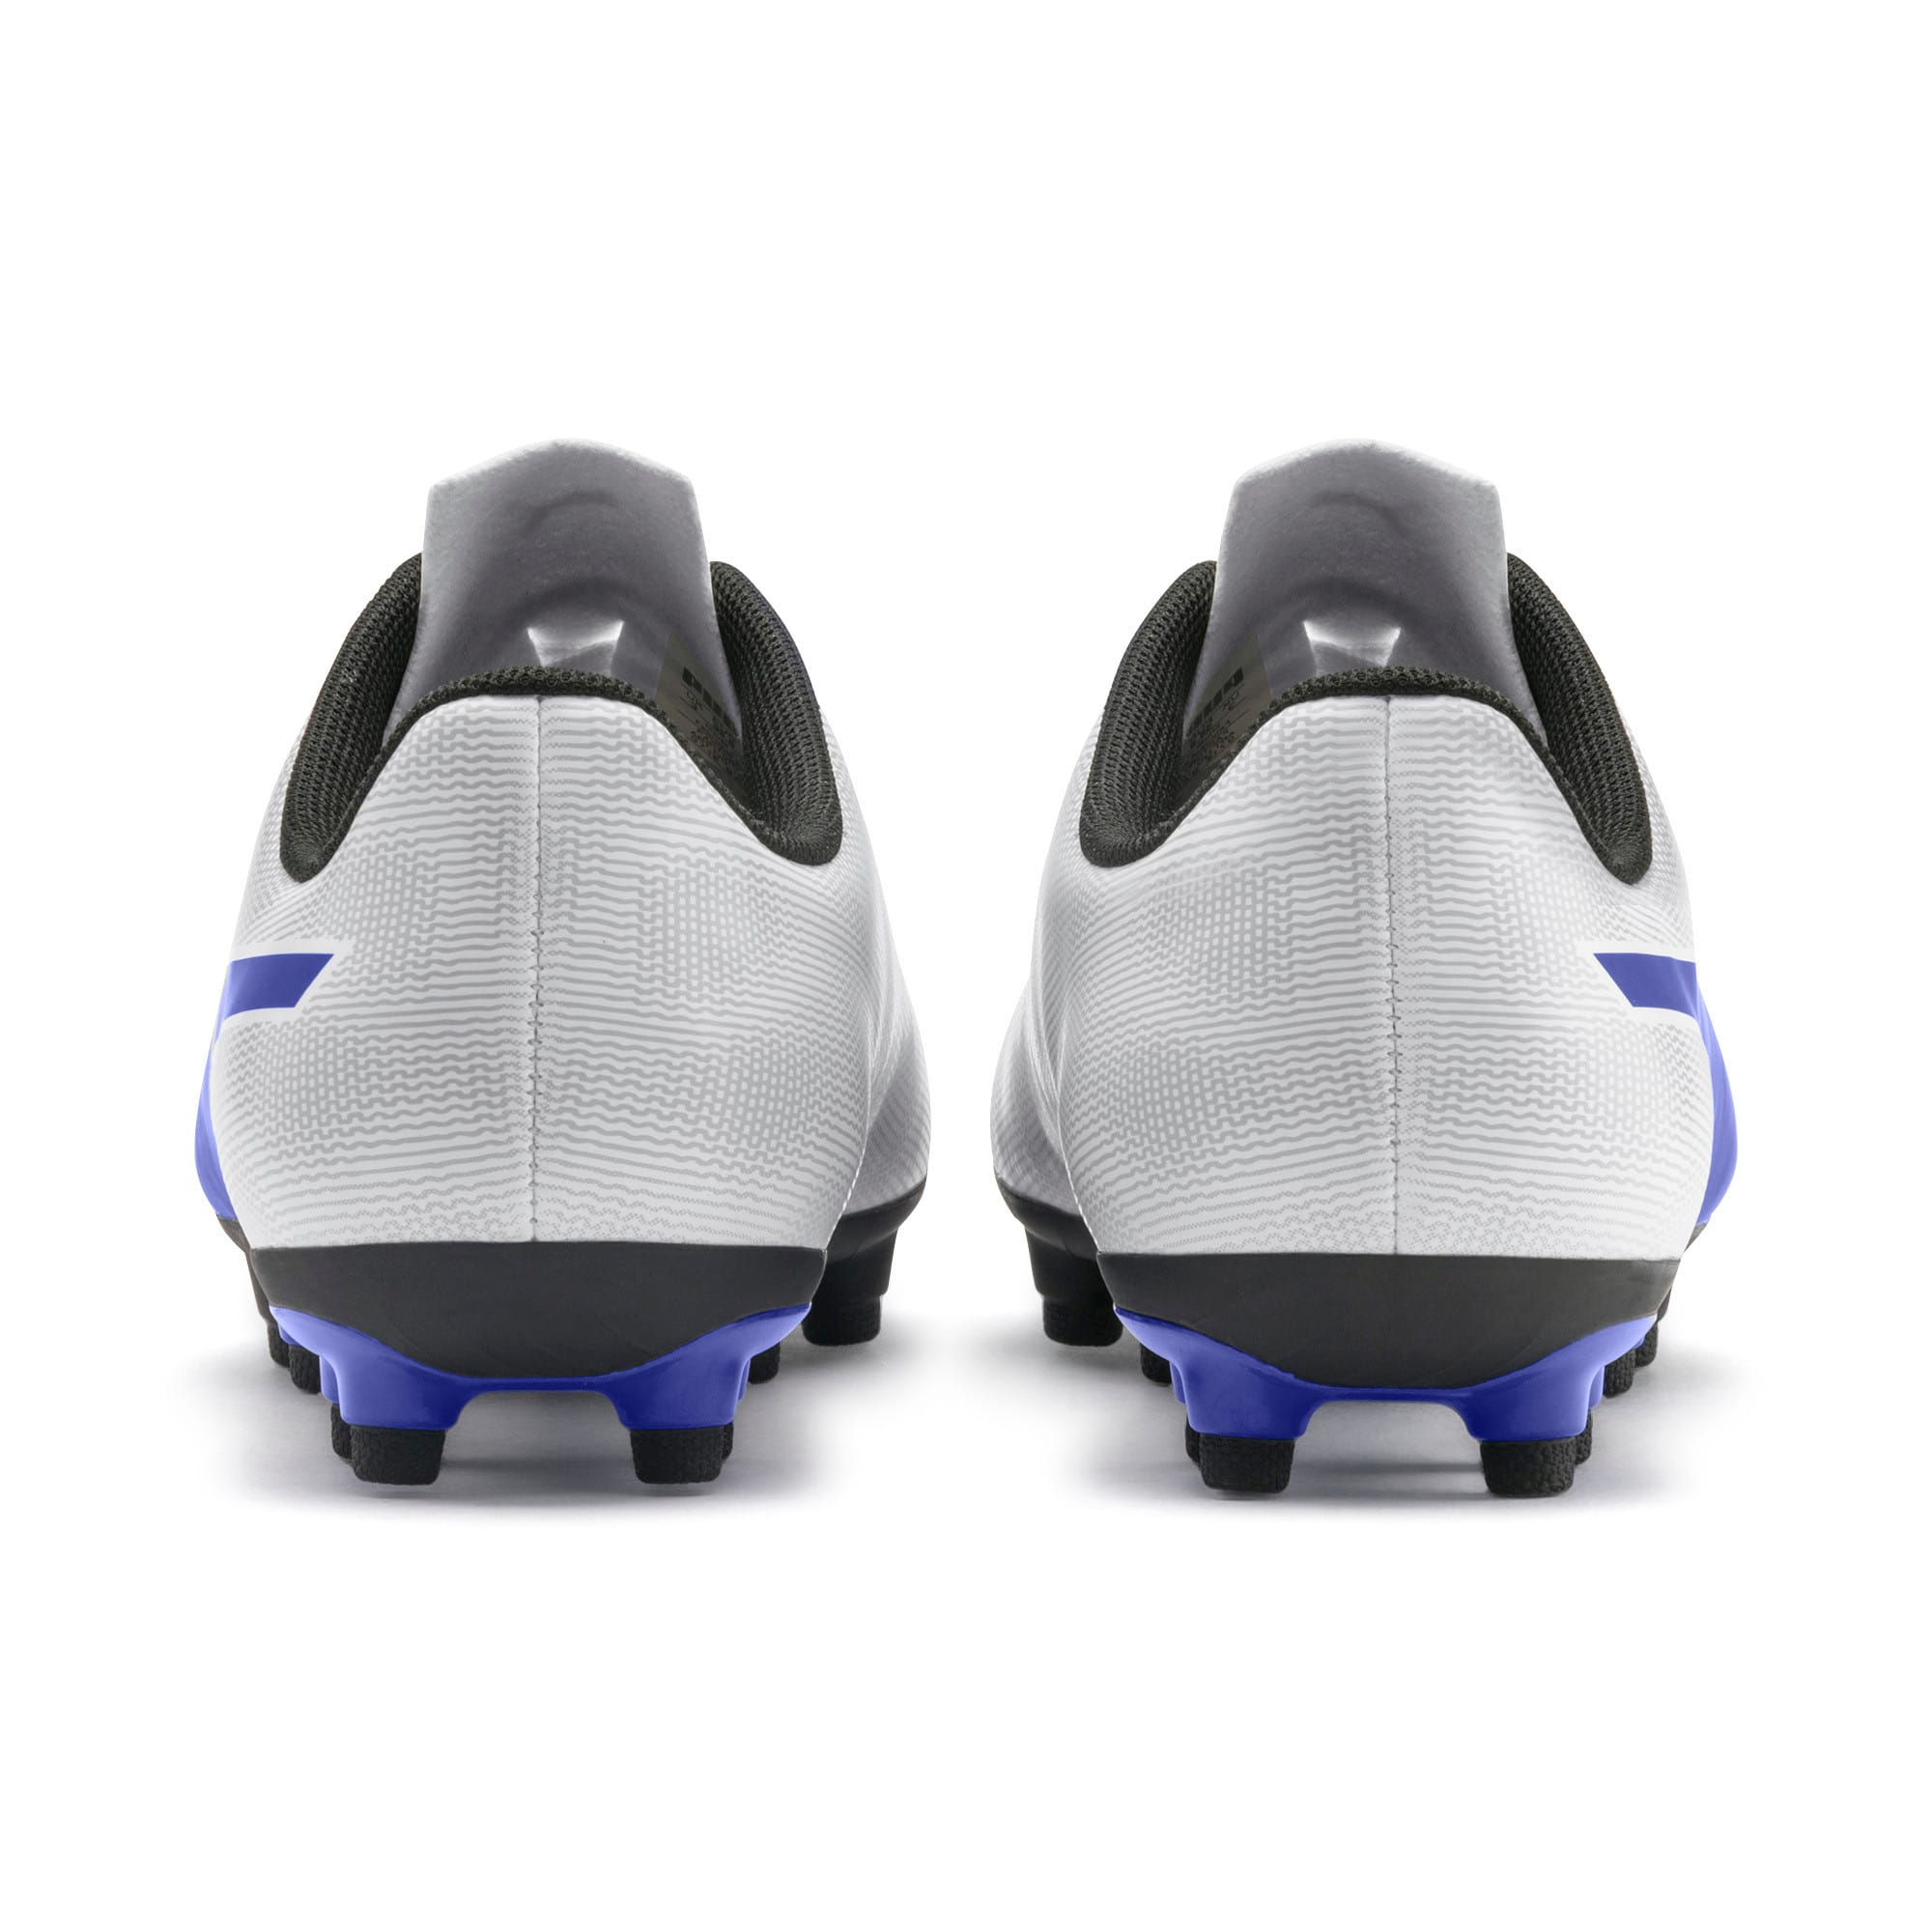 Thumbnail 3 of Rapido FG Boy's Soccer Cleats JR, White-Royal Blue-Light Gray, medium